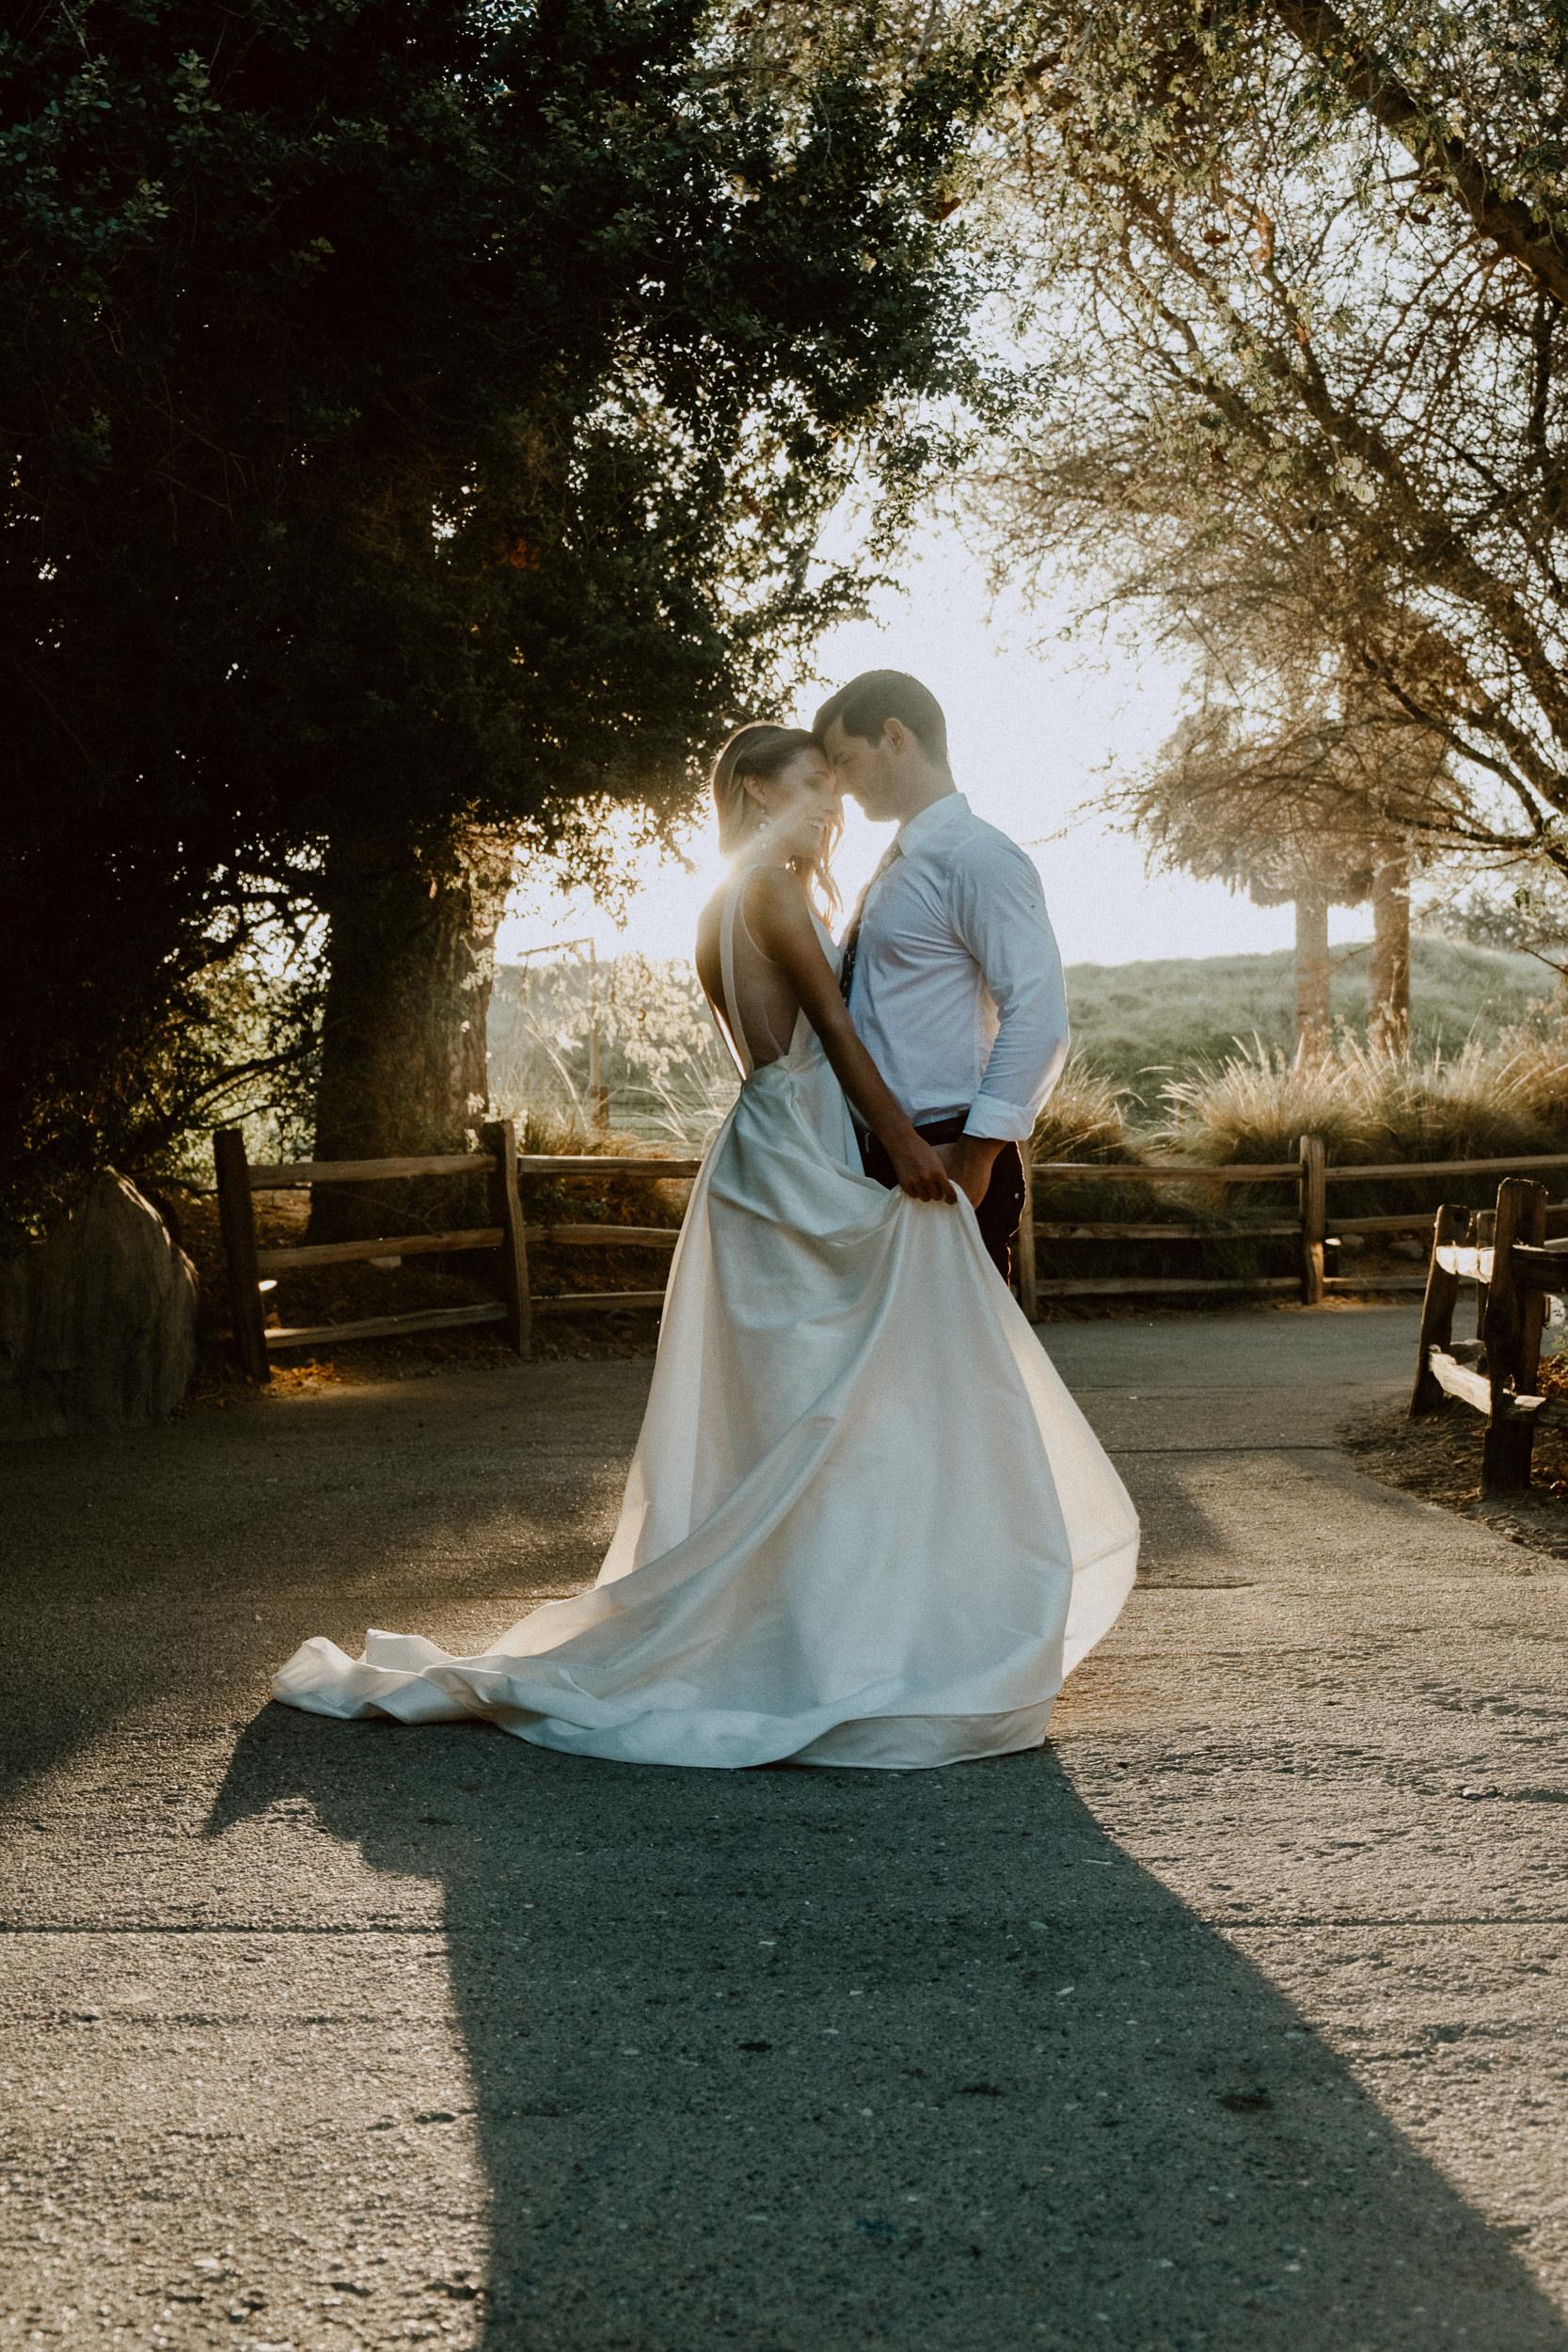 sChelsie + Chris - The Desert Shootout Wedding Romantics at The Living Desert-40.jpg